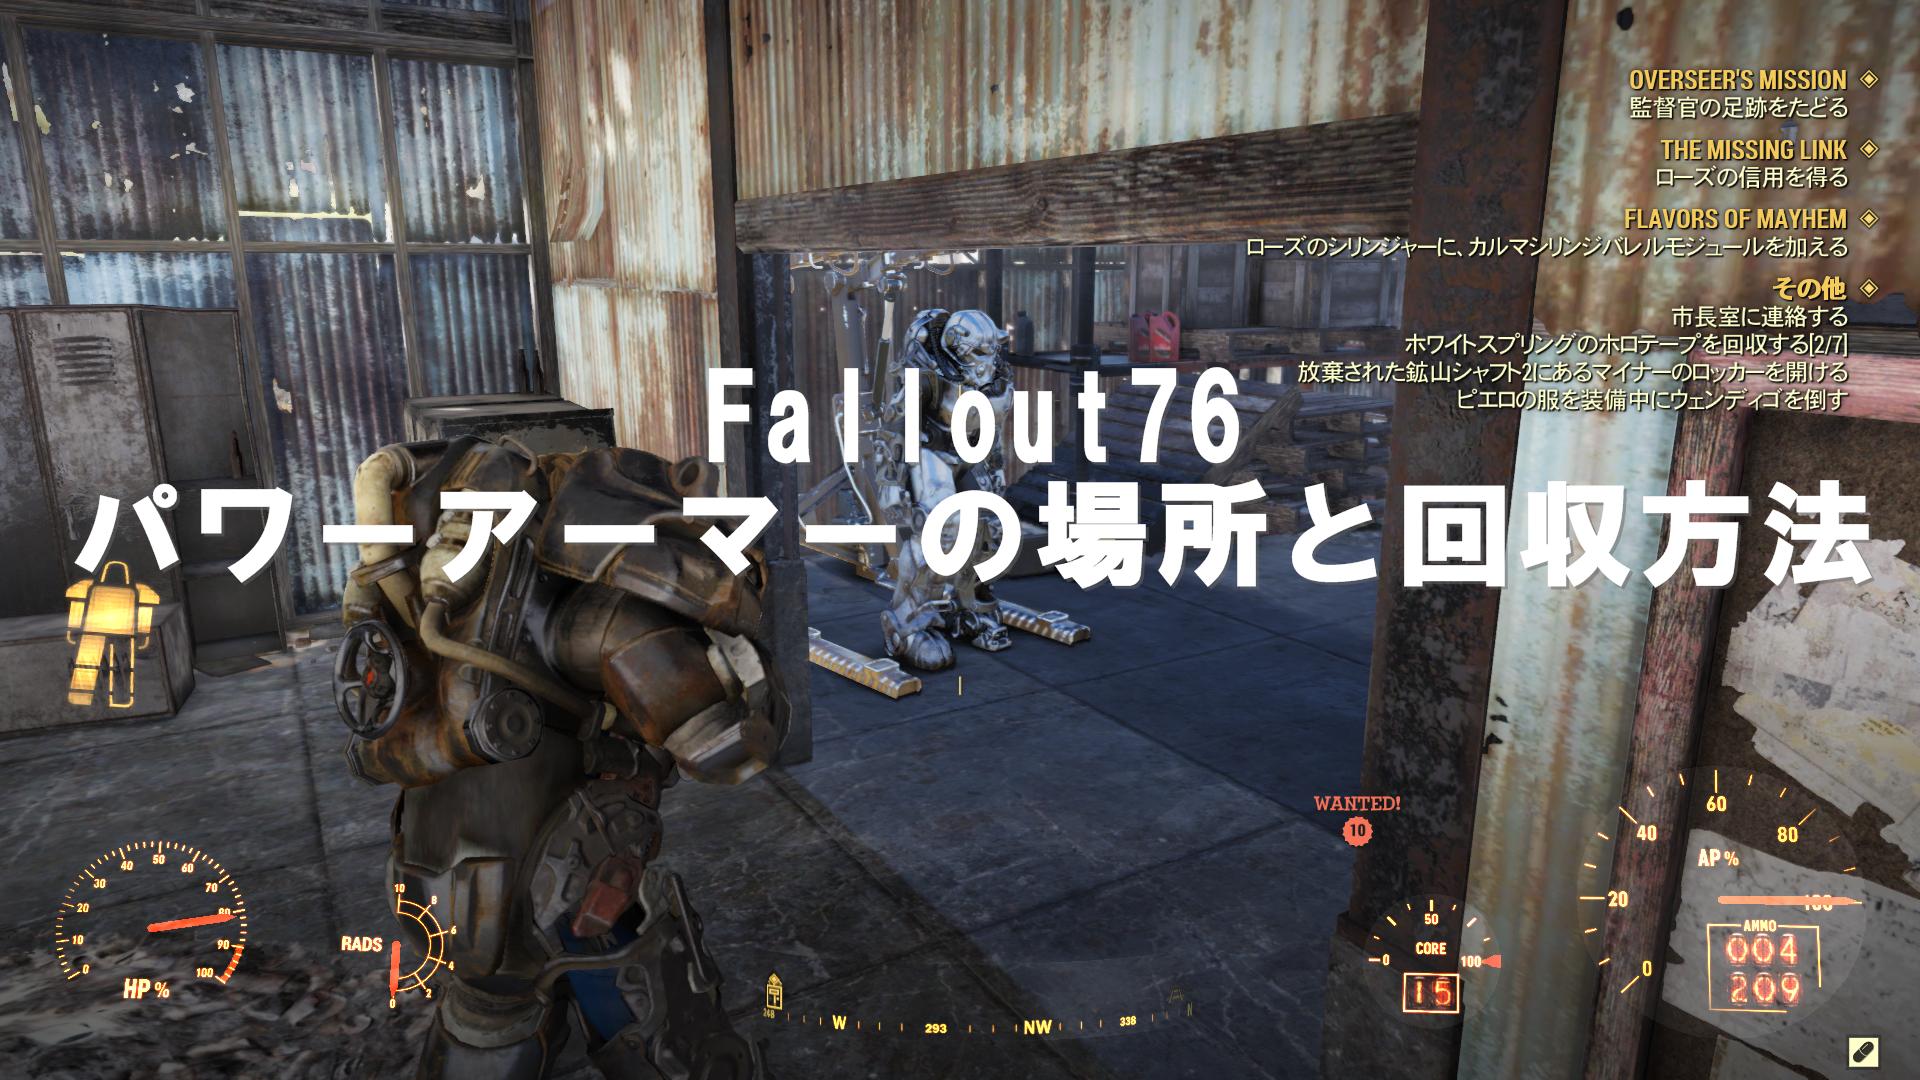 Fallout76:パワーアーマーの入手場所の位置とおすすめの回収方法